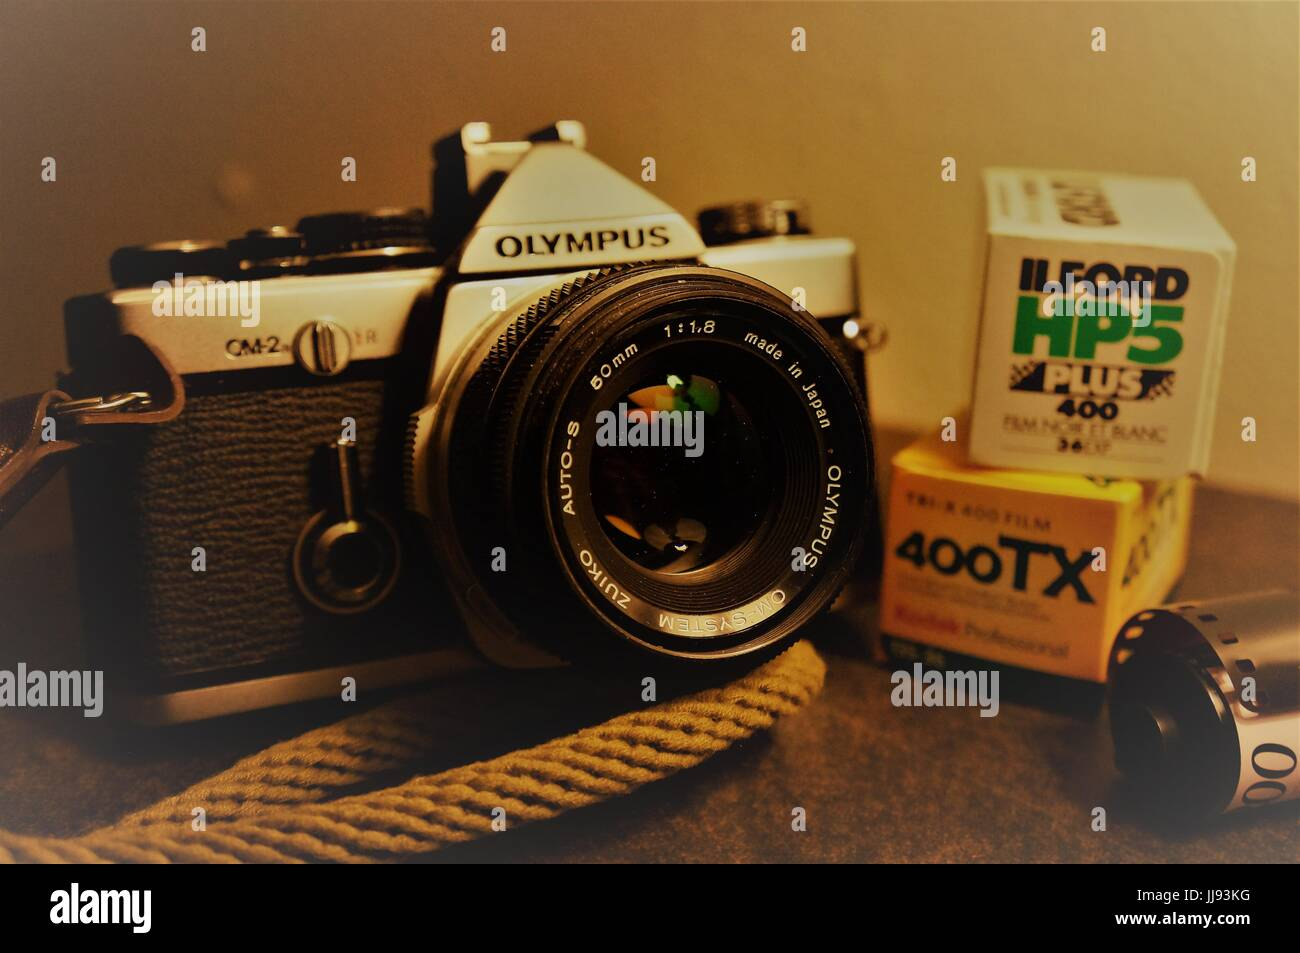 Vintage Olympus OM2n 35mm film camera with rolls of film - Stock Image